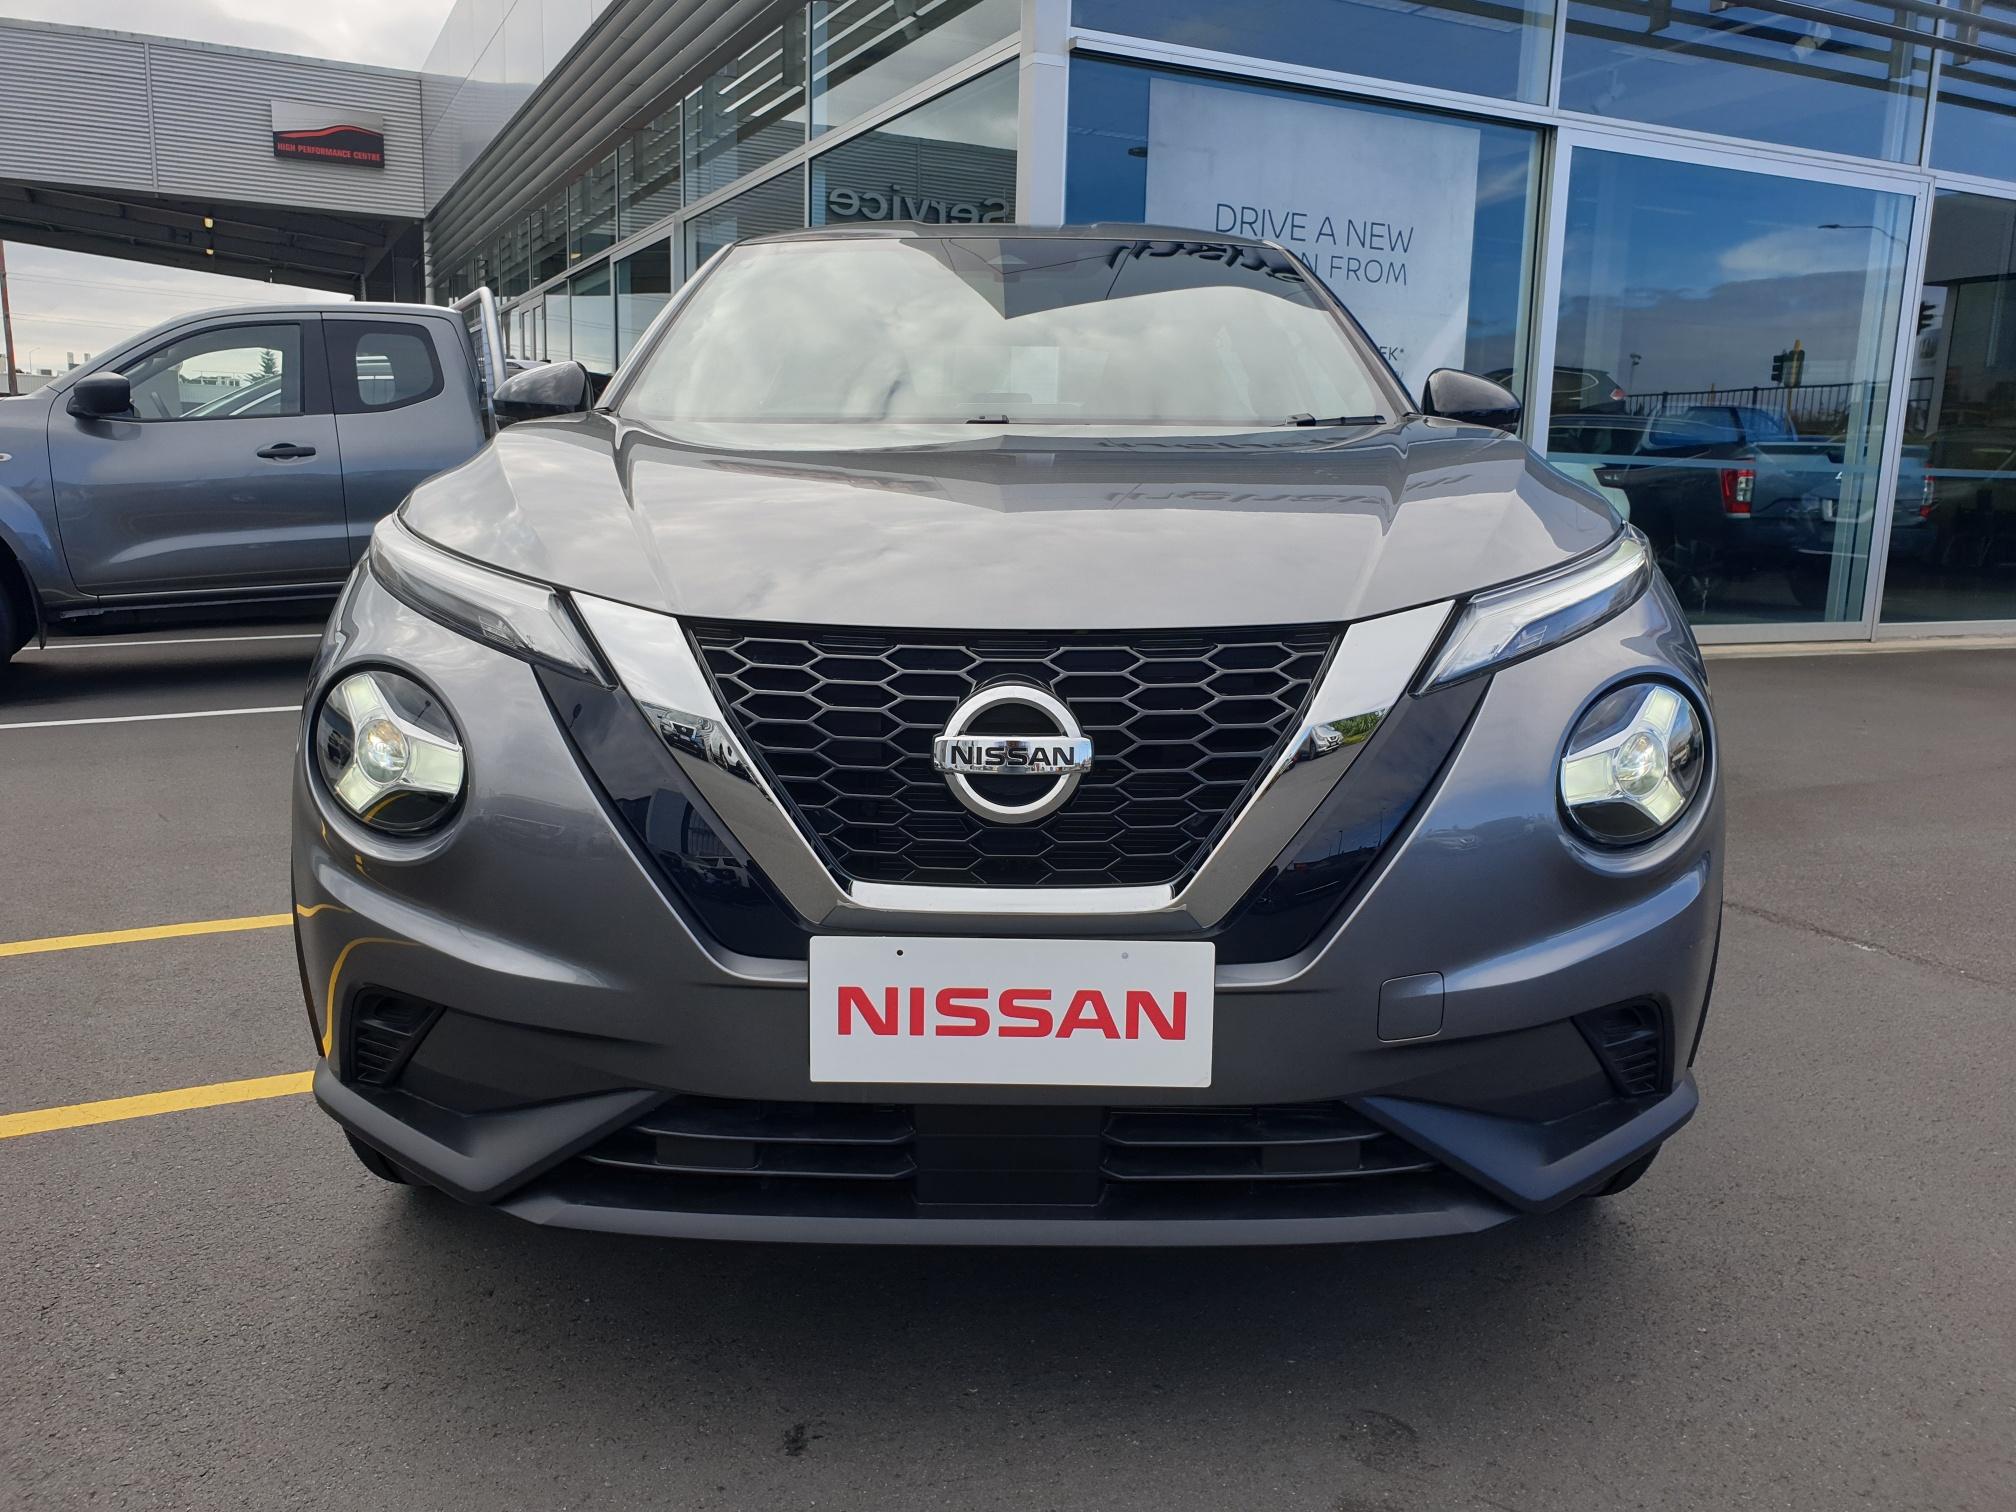 Nissan Juke 2021 | ST 1.0PT/7AT